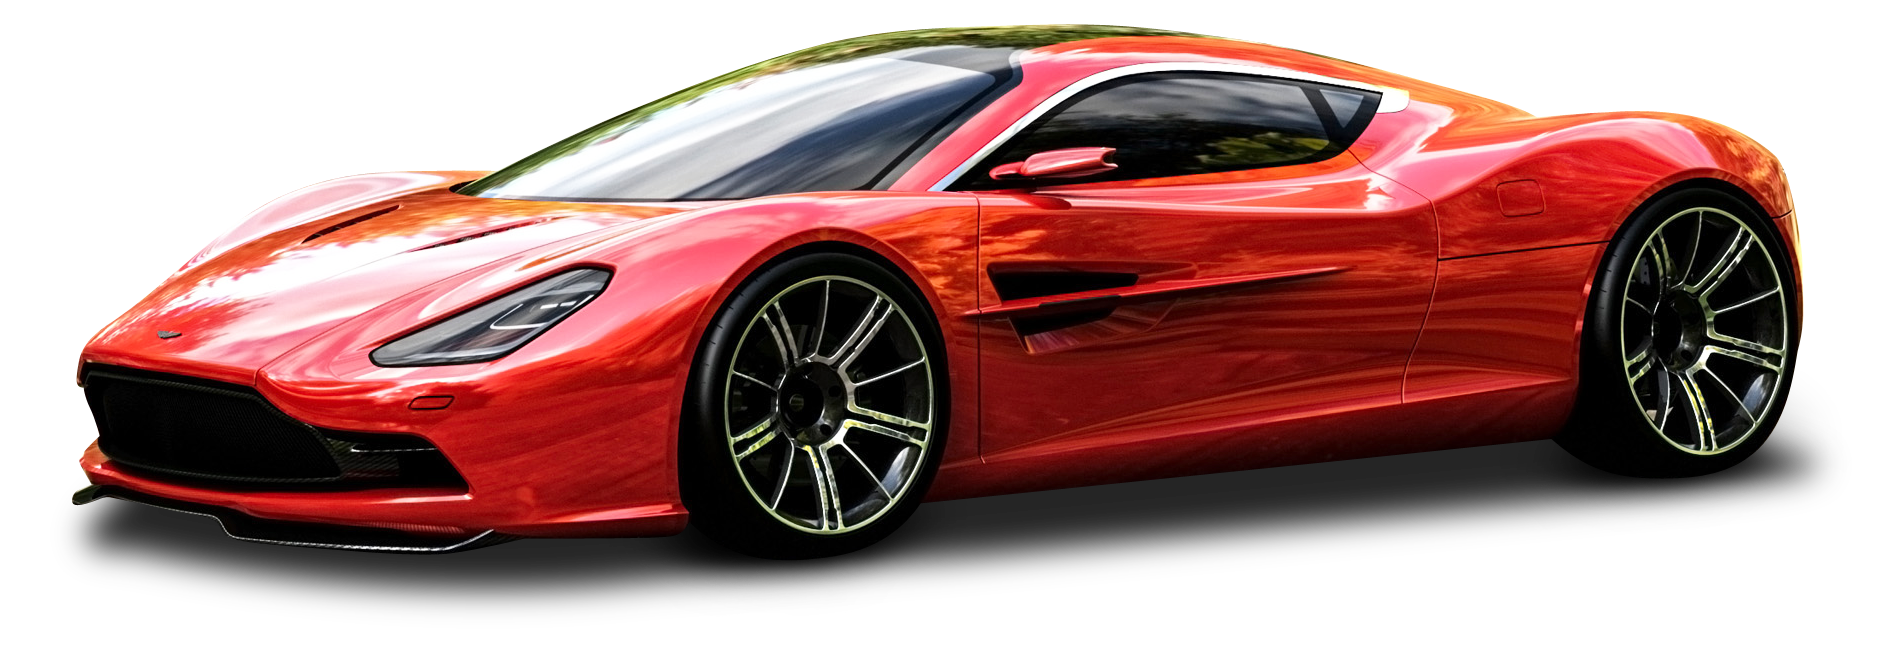 Red Aston Martin DBC Car PNG Image